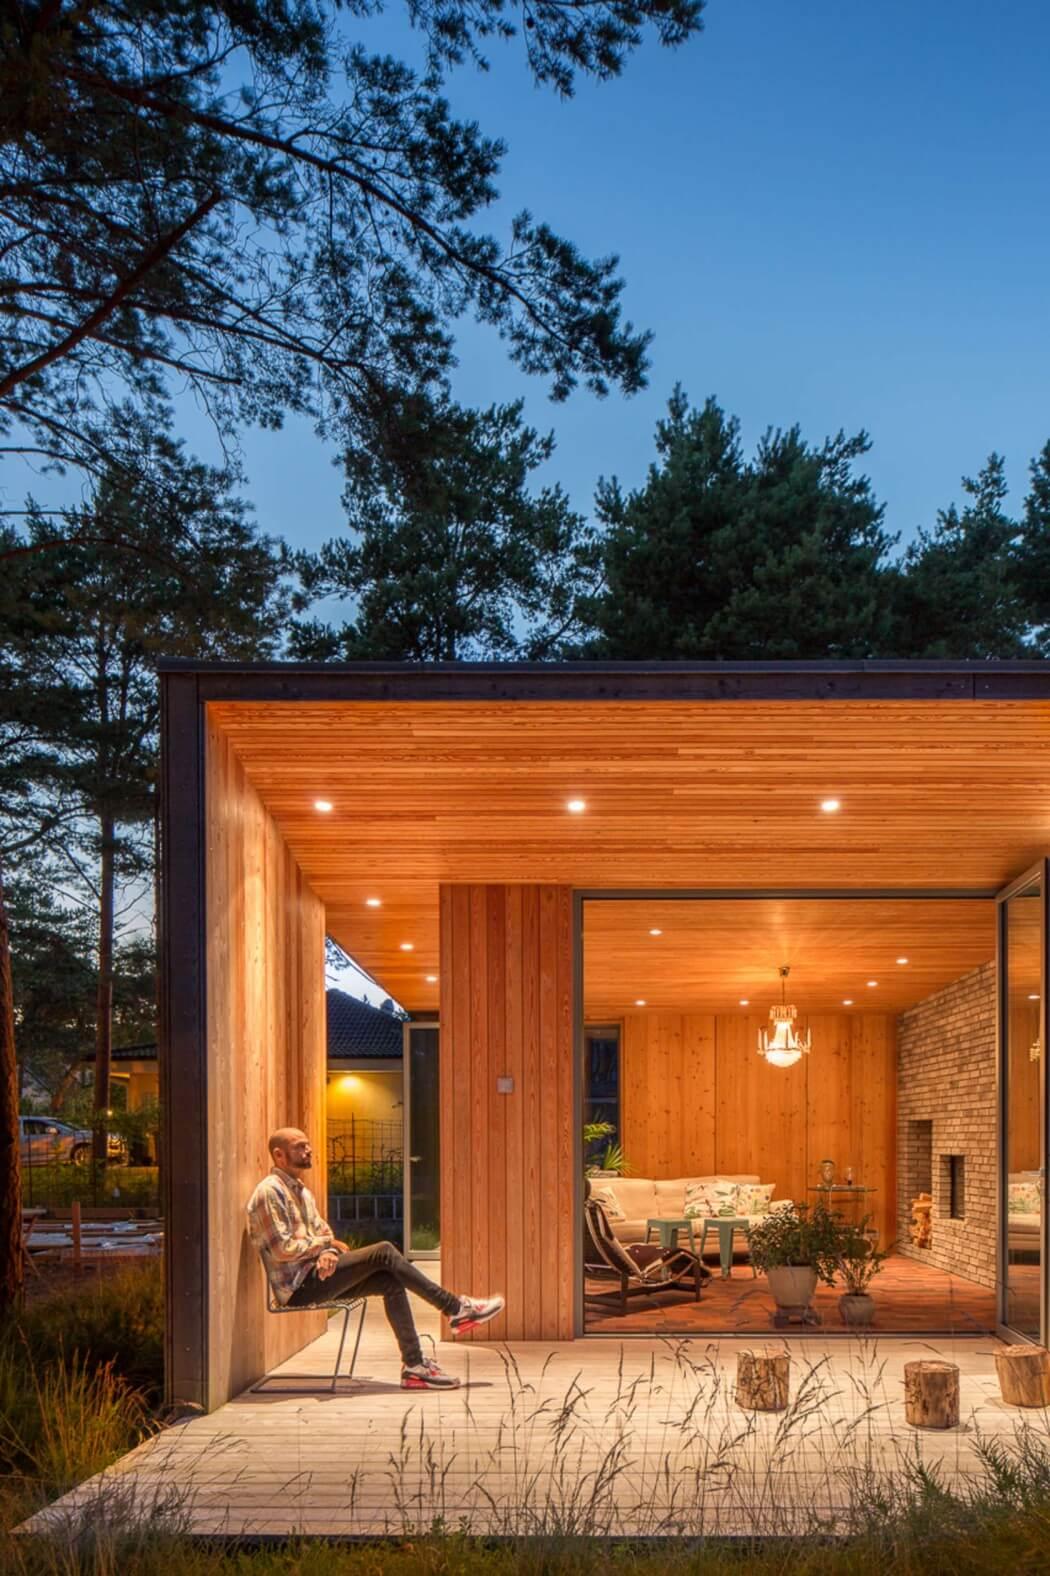 028-villa-ljung-johan-sundberg-arkitektur-1050x1576